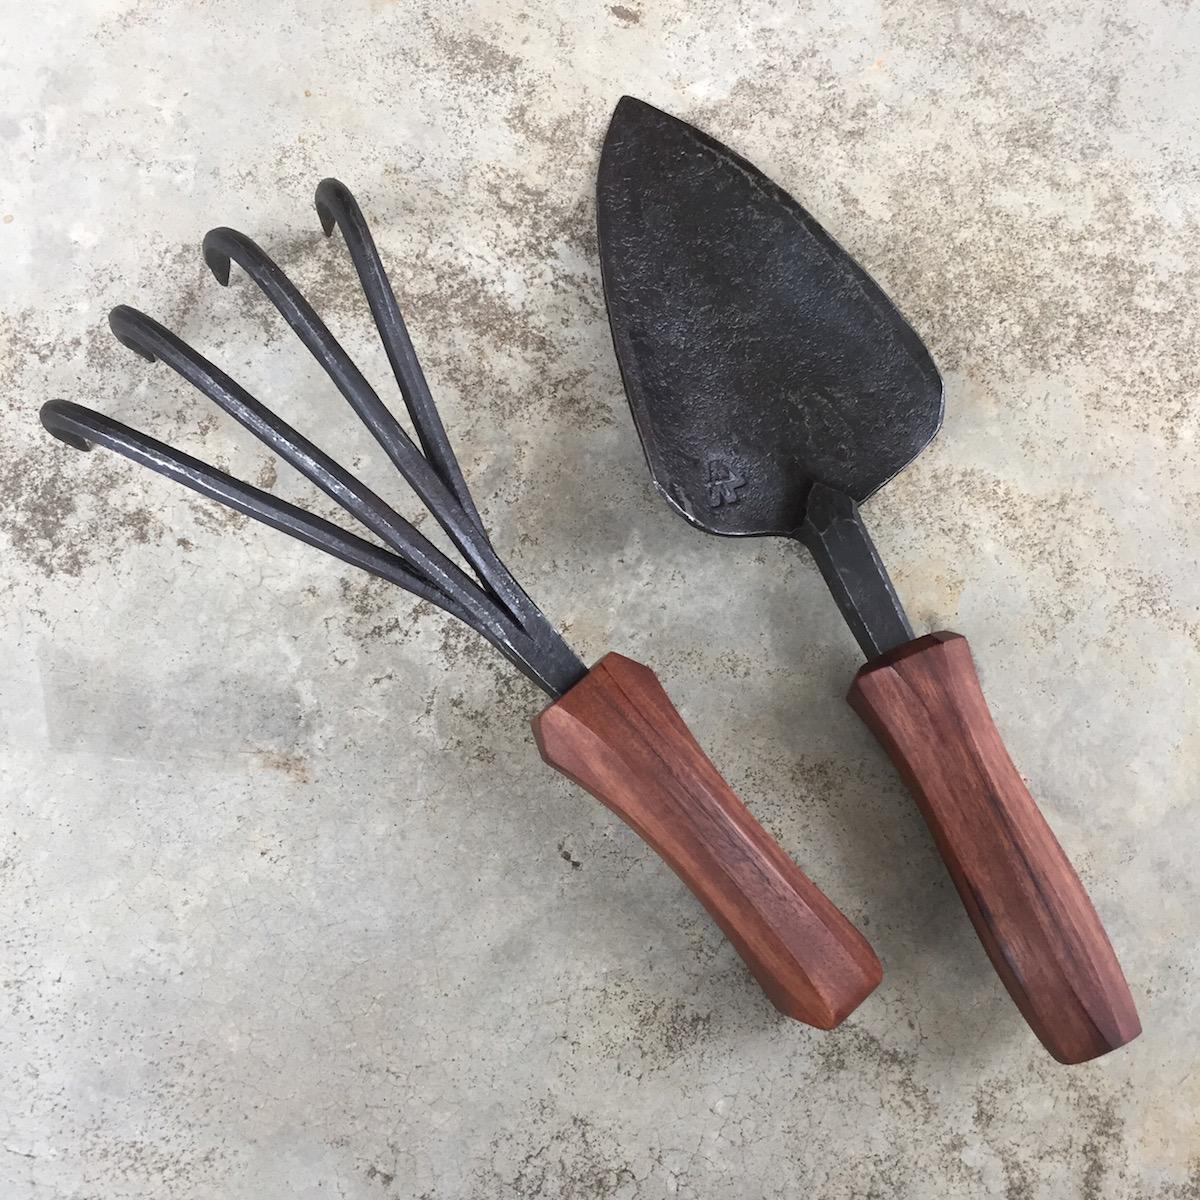 bryant garden tools '17.jpg